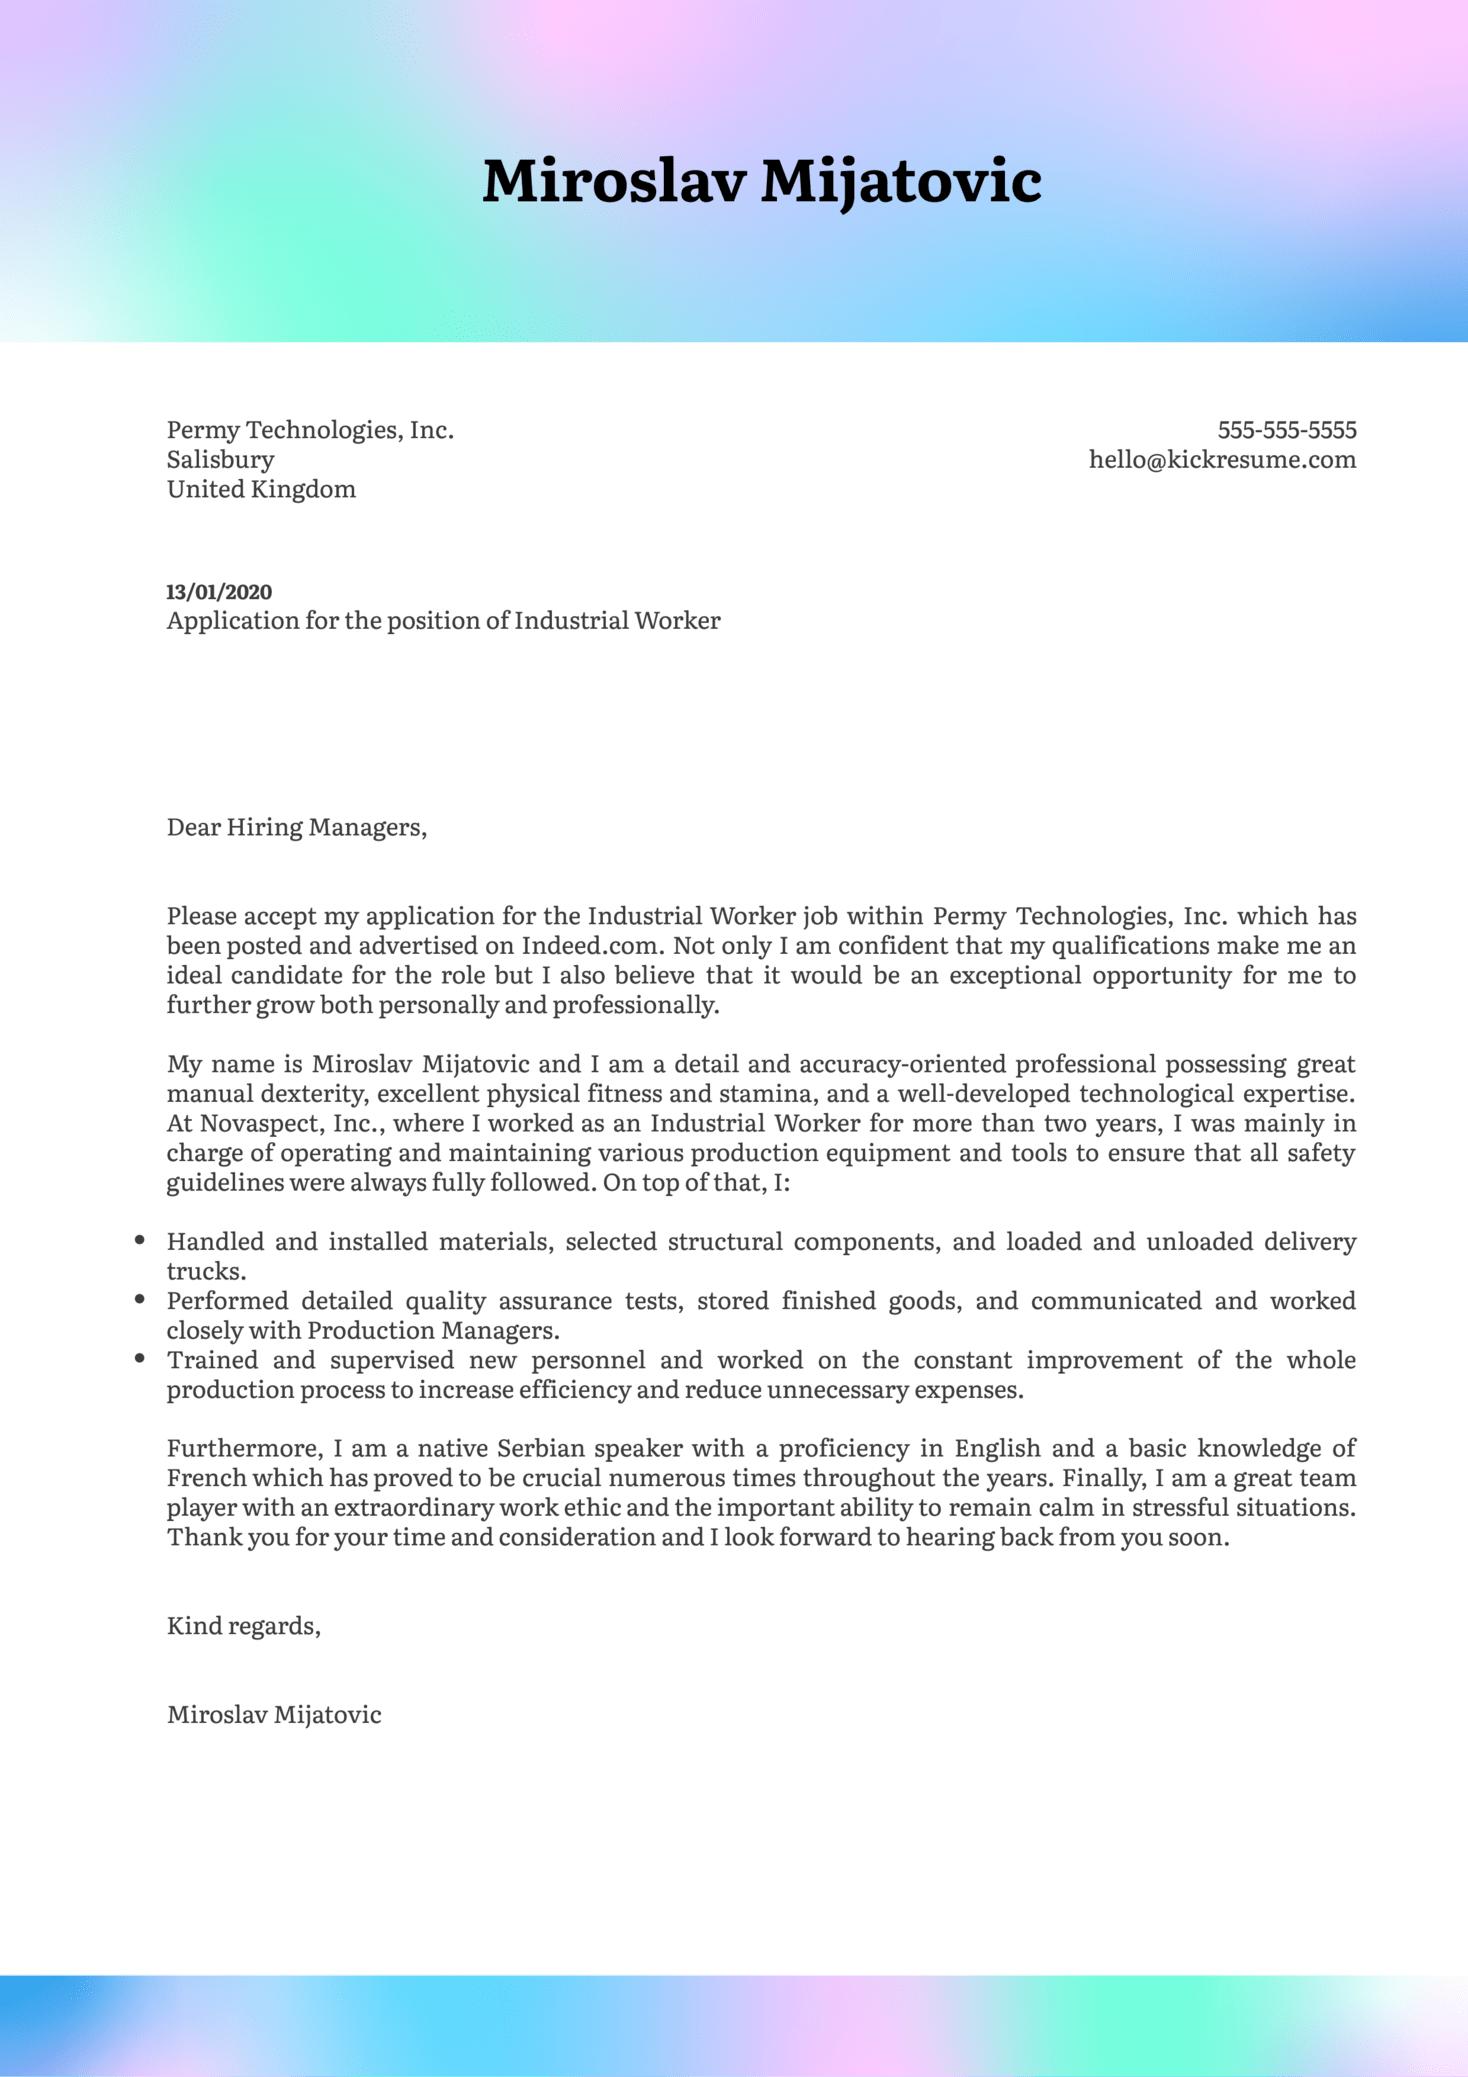 Industrial Worker Cover Letter Sample